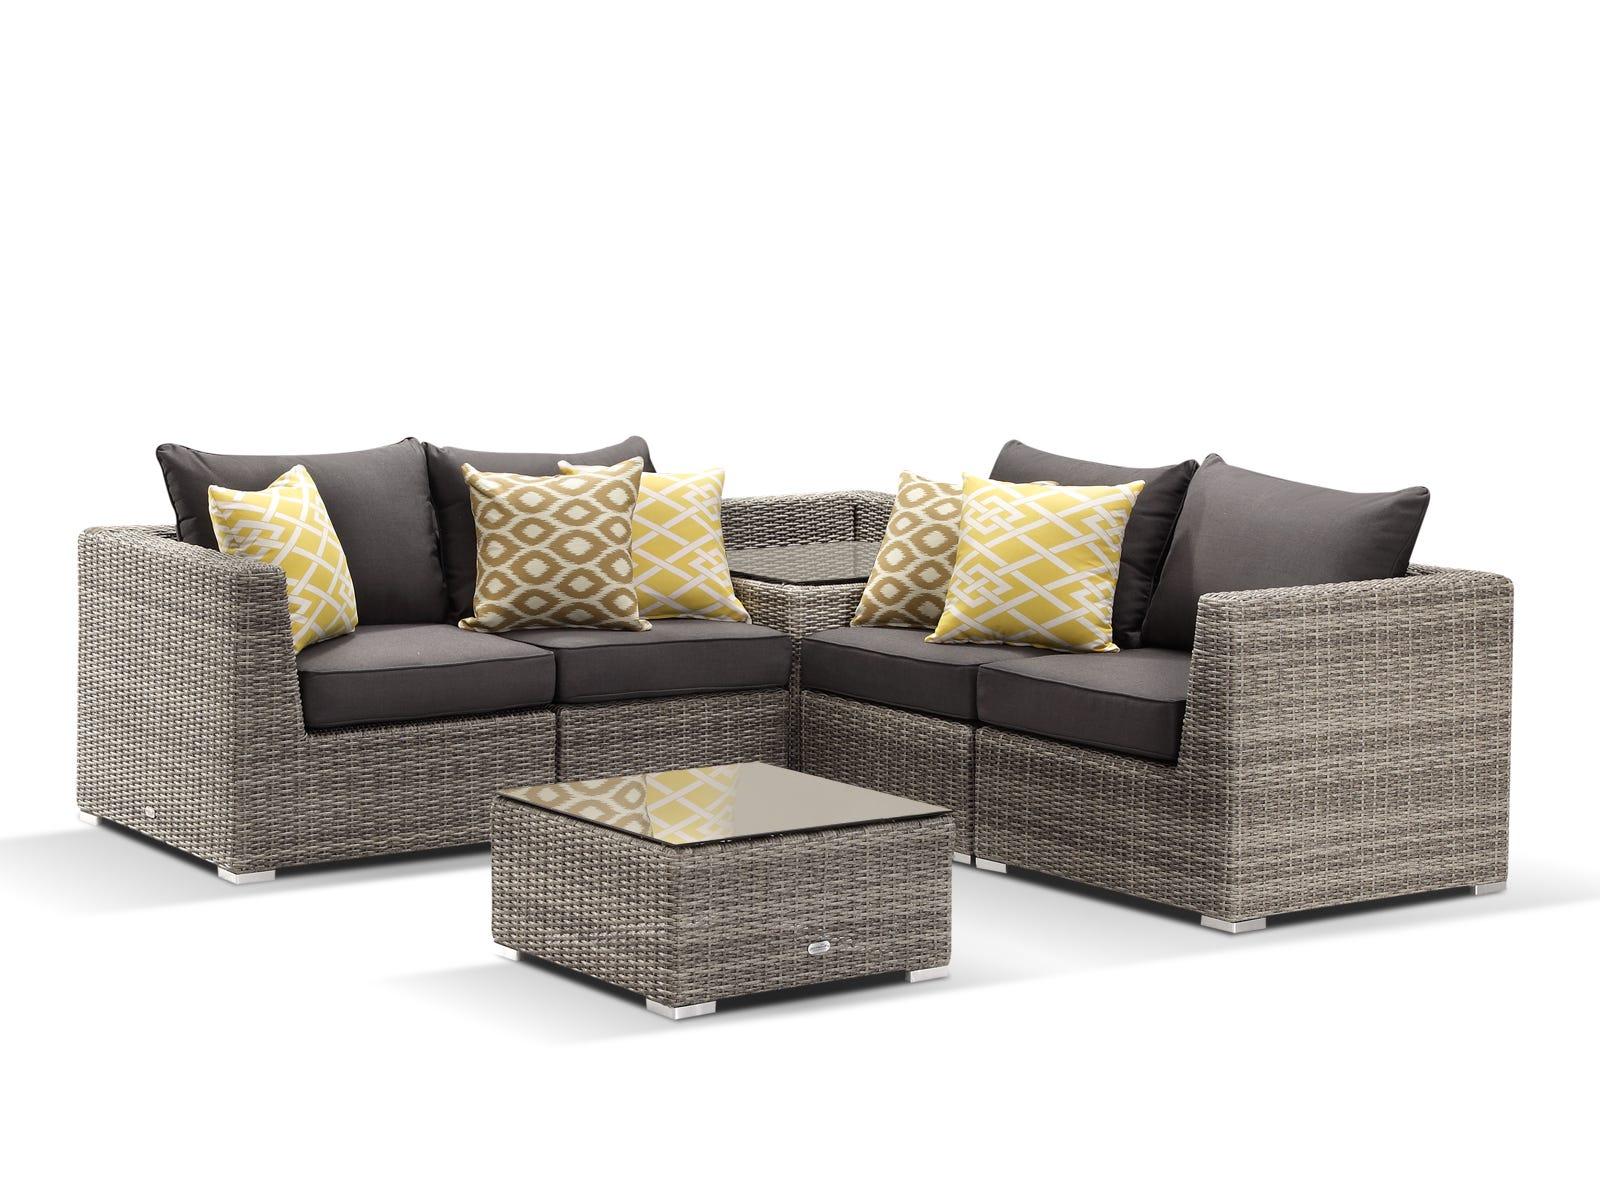 Outdoor furniture lounge wicker sunbrella mateus 6pc moonscape